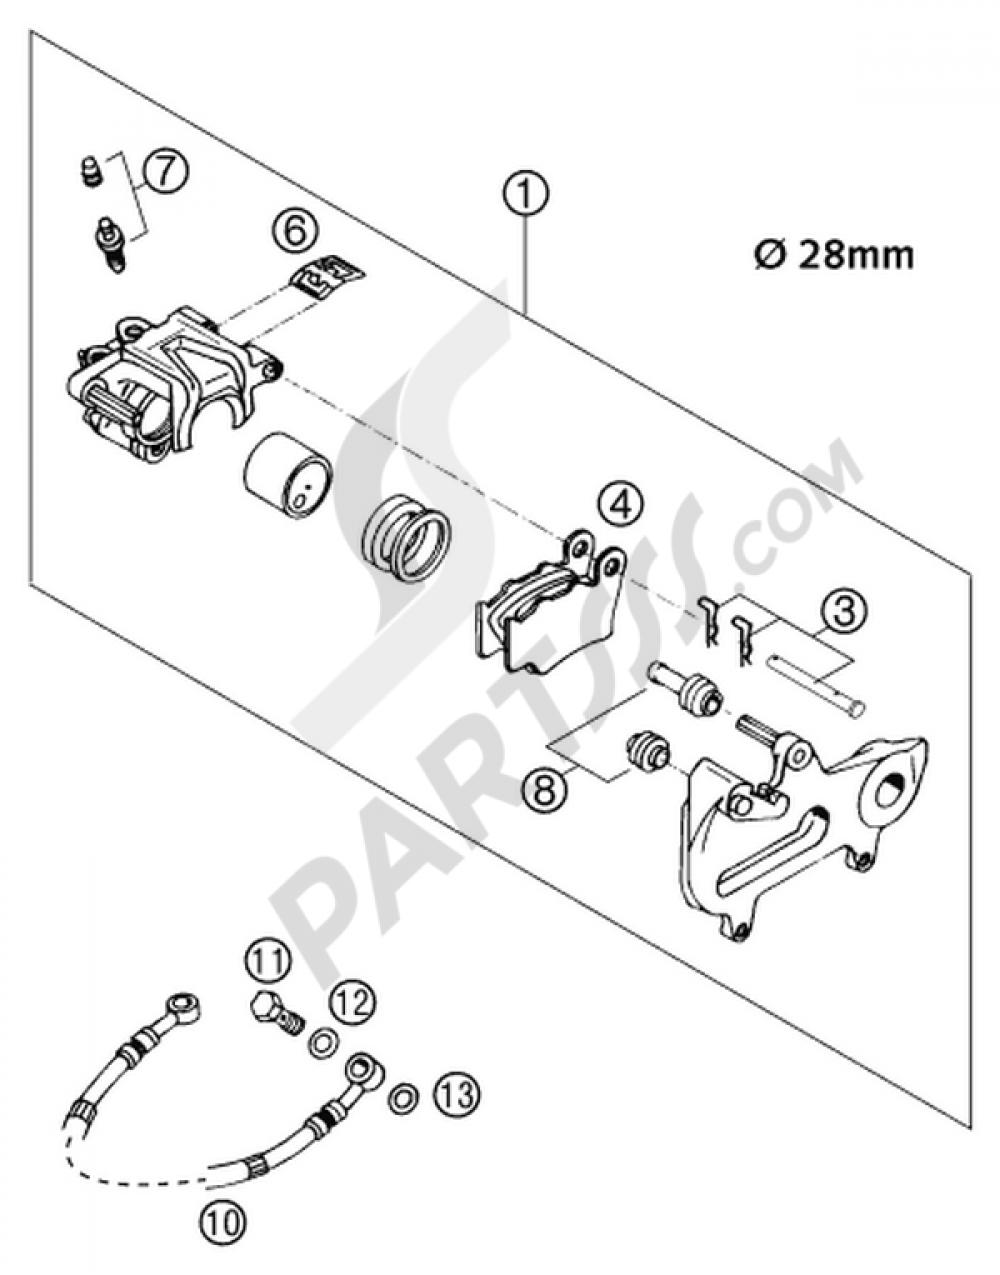 Brake Caliper Rear Brembo 2001 Ktm 125 Exc Six Days 2002 Eu Wiring Diagram 200